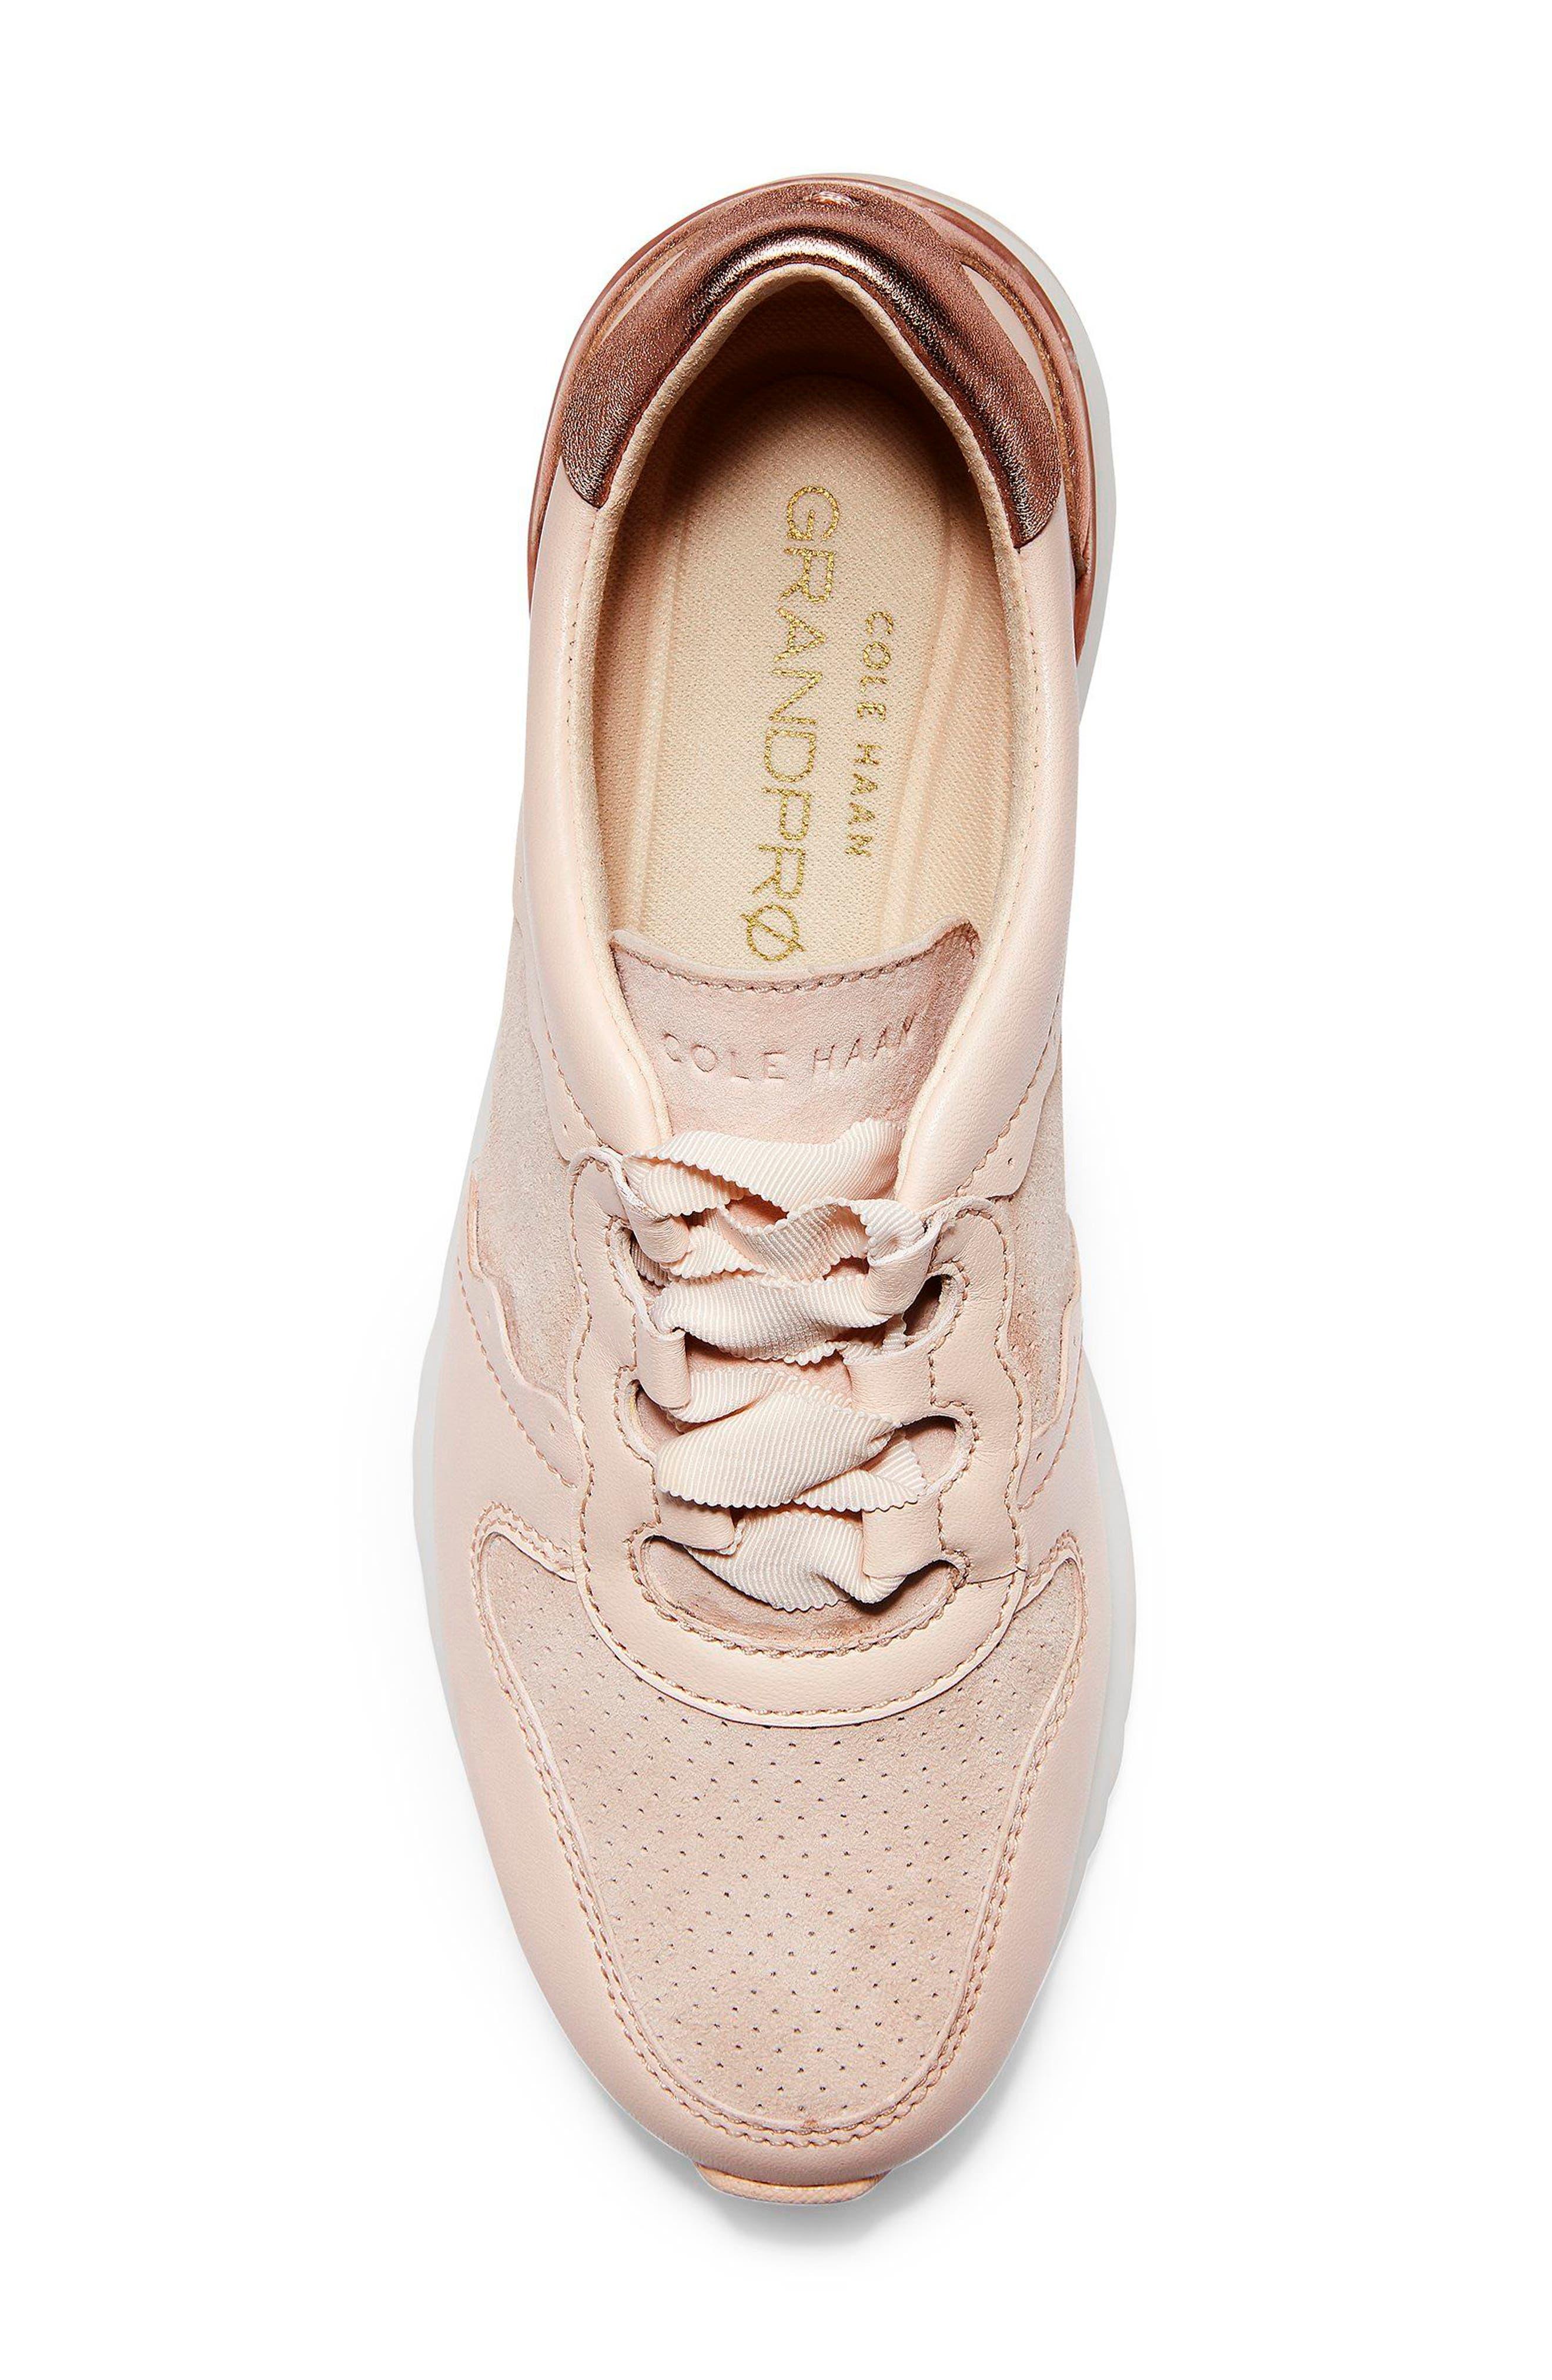 GrandPro Wedge Sneaker,                             Alternate thumbnail 5, color,                             Peach Blush Suede